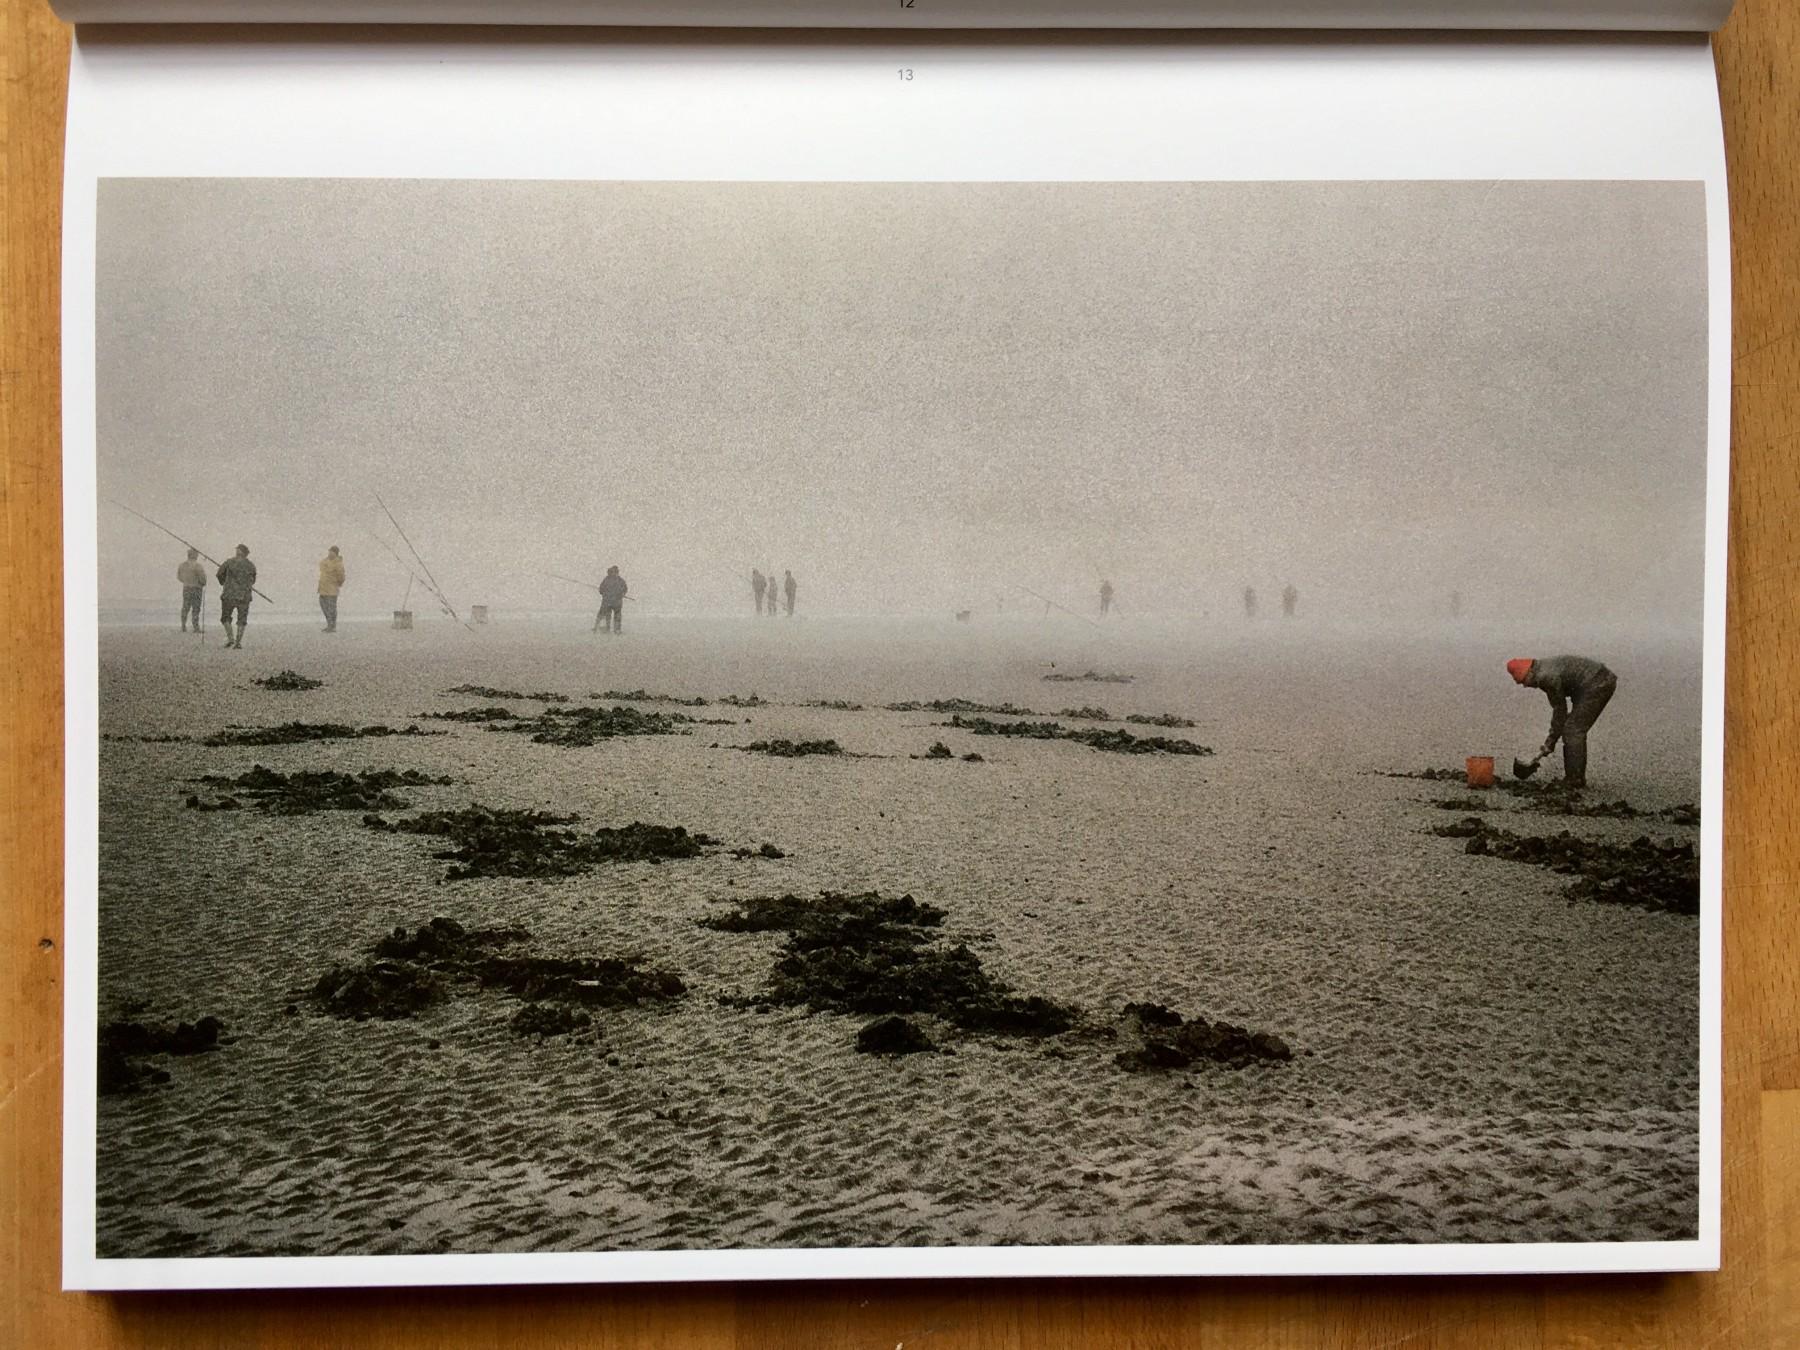 enster-blog-di-cultura-fotografica-harry-gruyaert-rivage-101.JPG